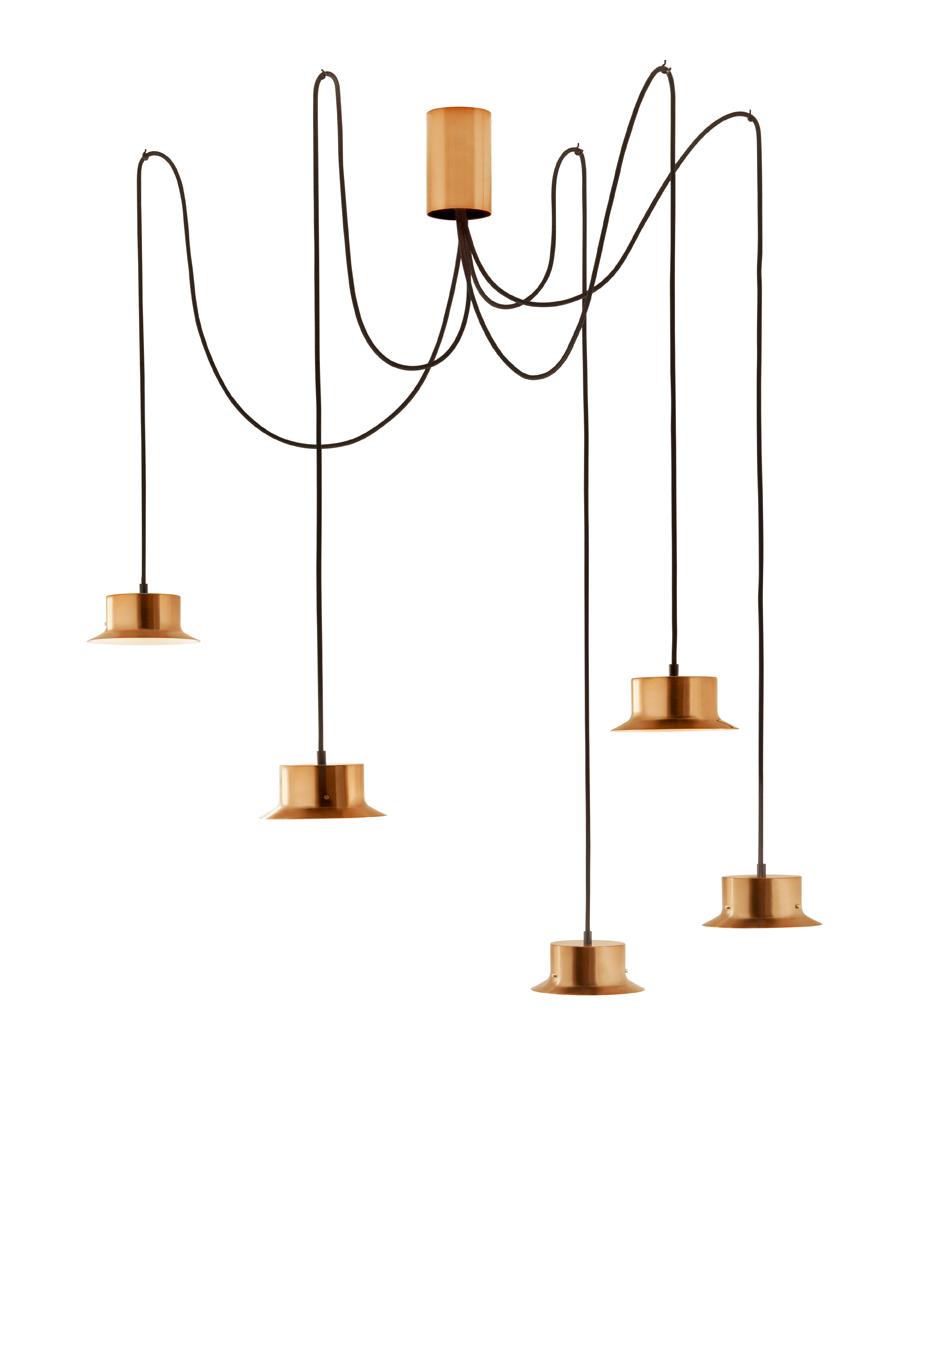 Maine Lámpara Colgante metálico 17,5W Oro Satinado